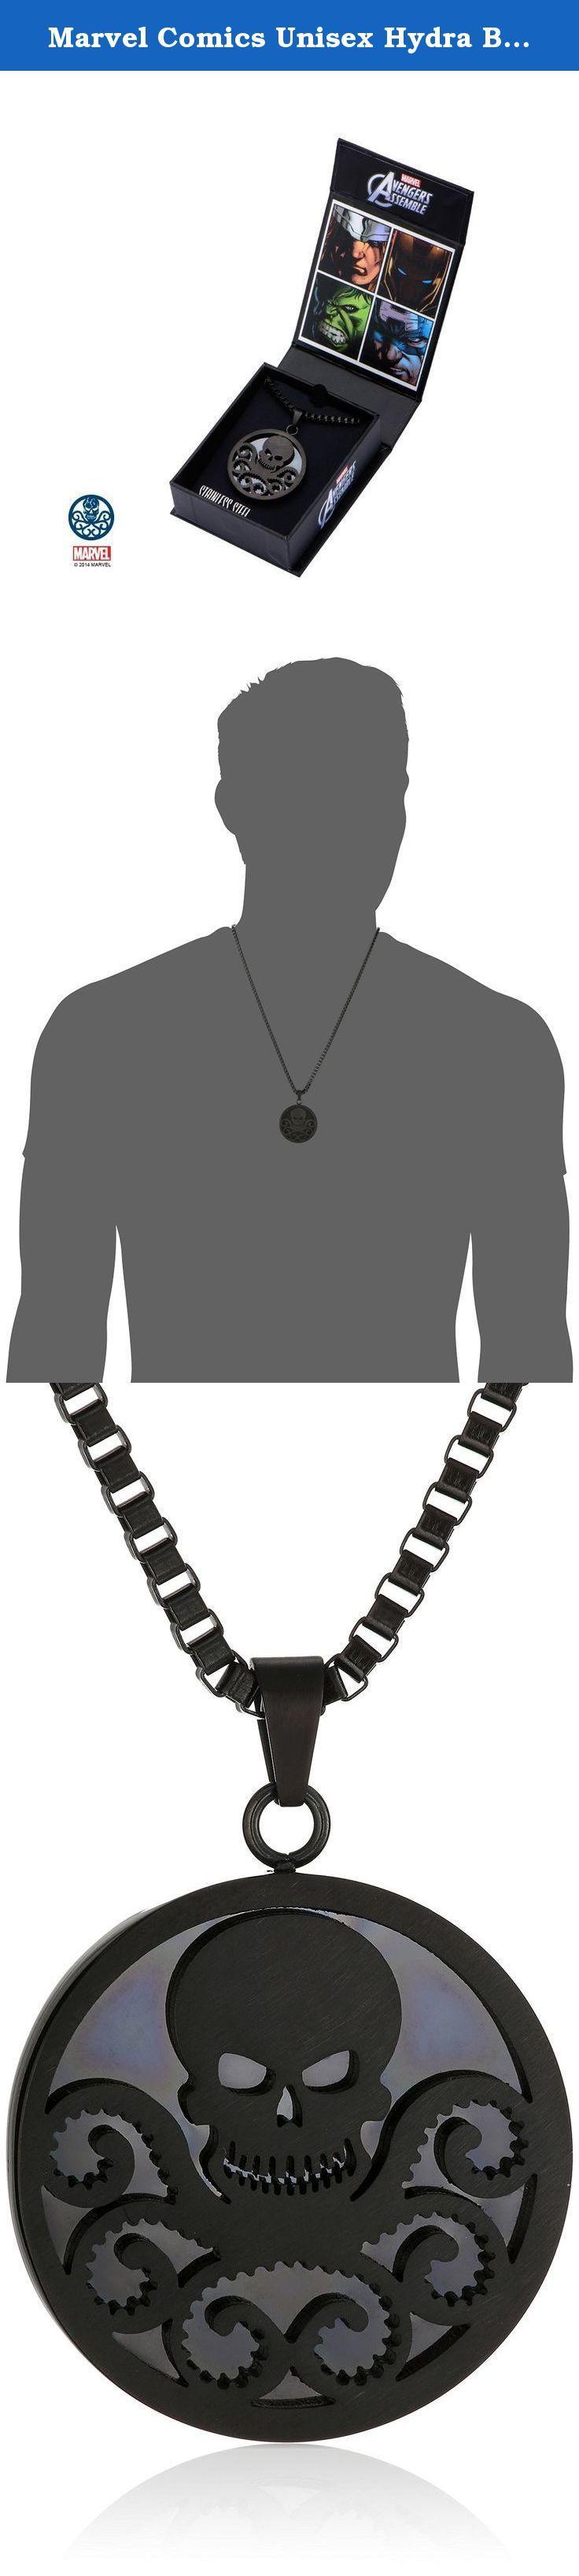 "Marvel Comics Unisex Hydra Black Stainless Steel Chain Pendant Necklace, 24"". Marvel Comics Hydra Pendant Necklace - 24"" Item Category: Necklaces Material: Stainless Steel Necklace Length: 24"" ."